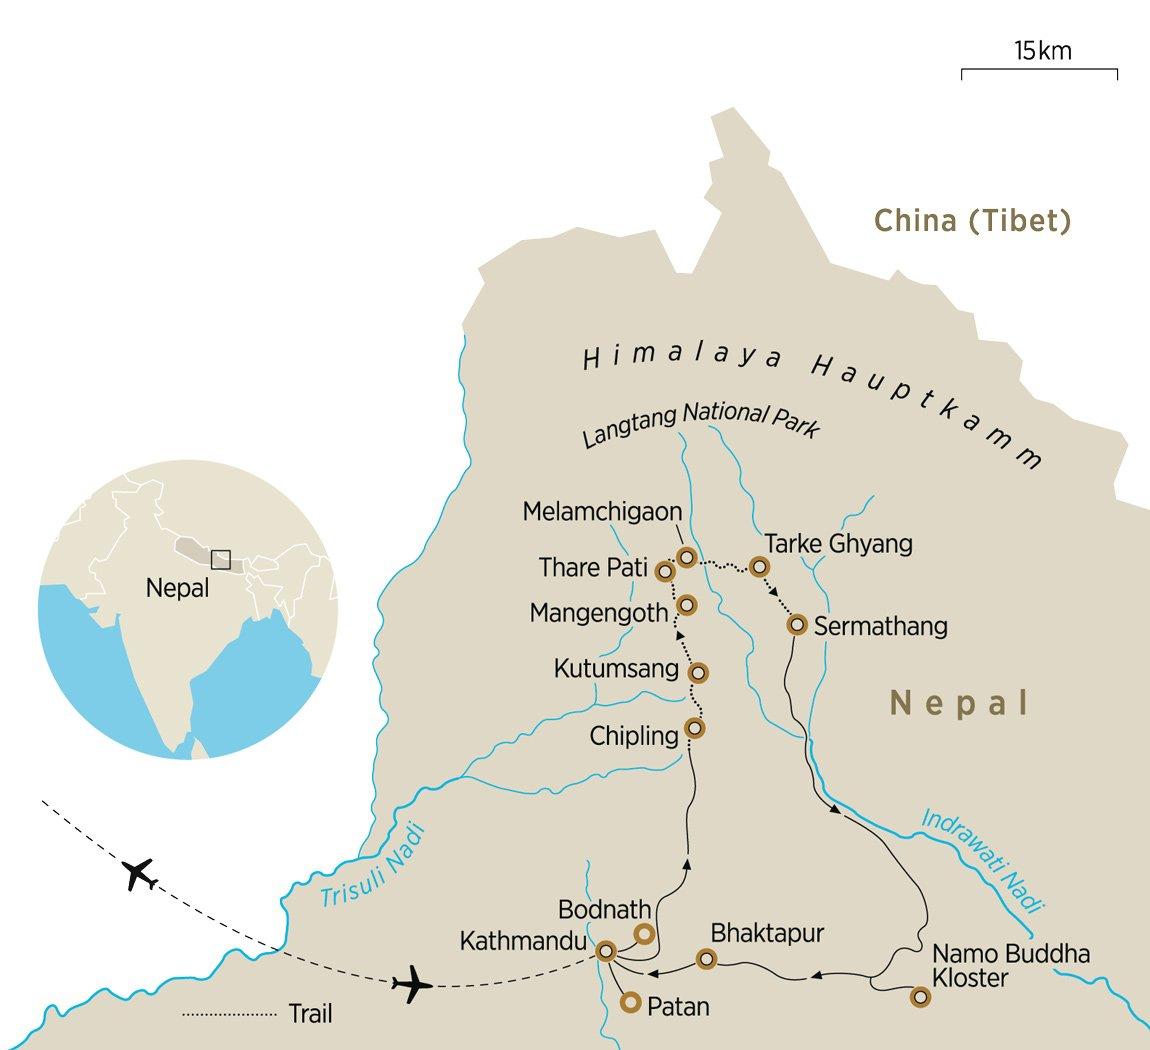 ASI-097_Nepal-climate_20